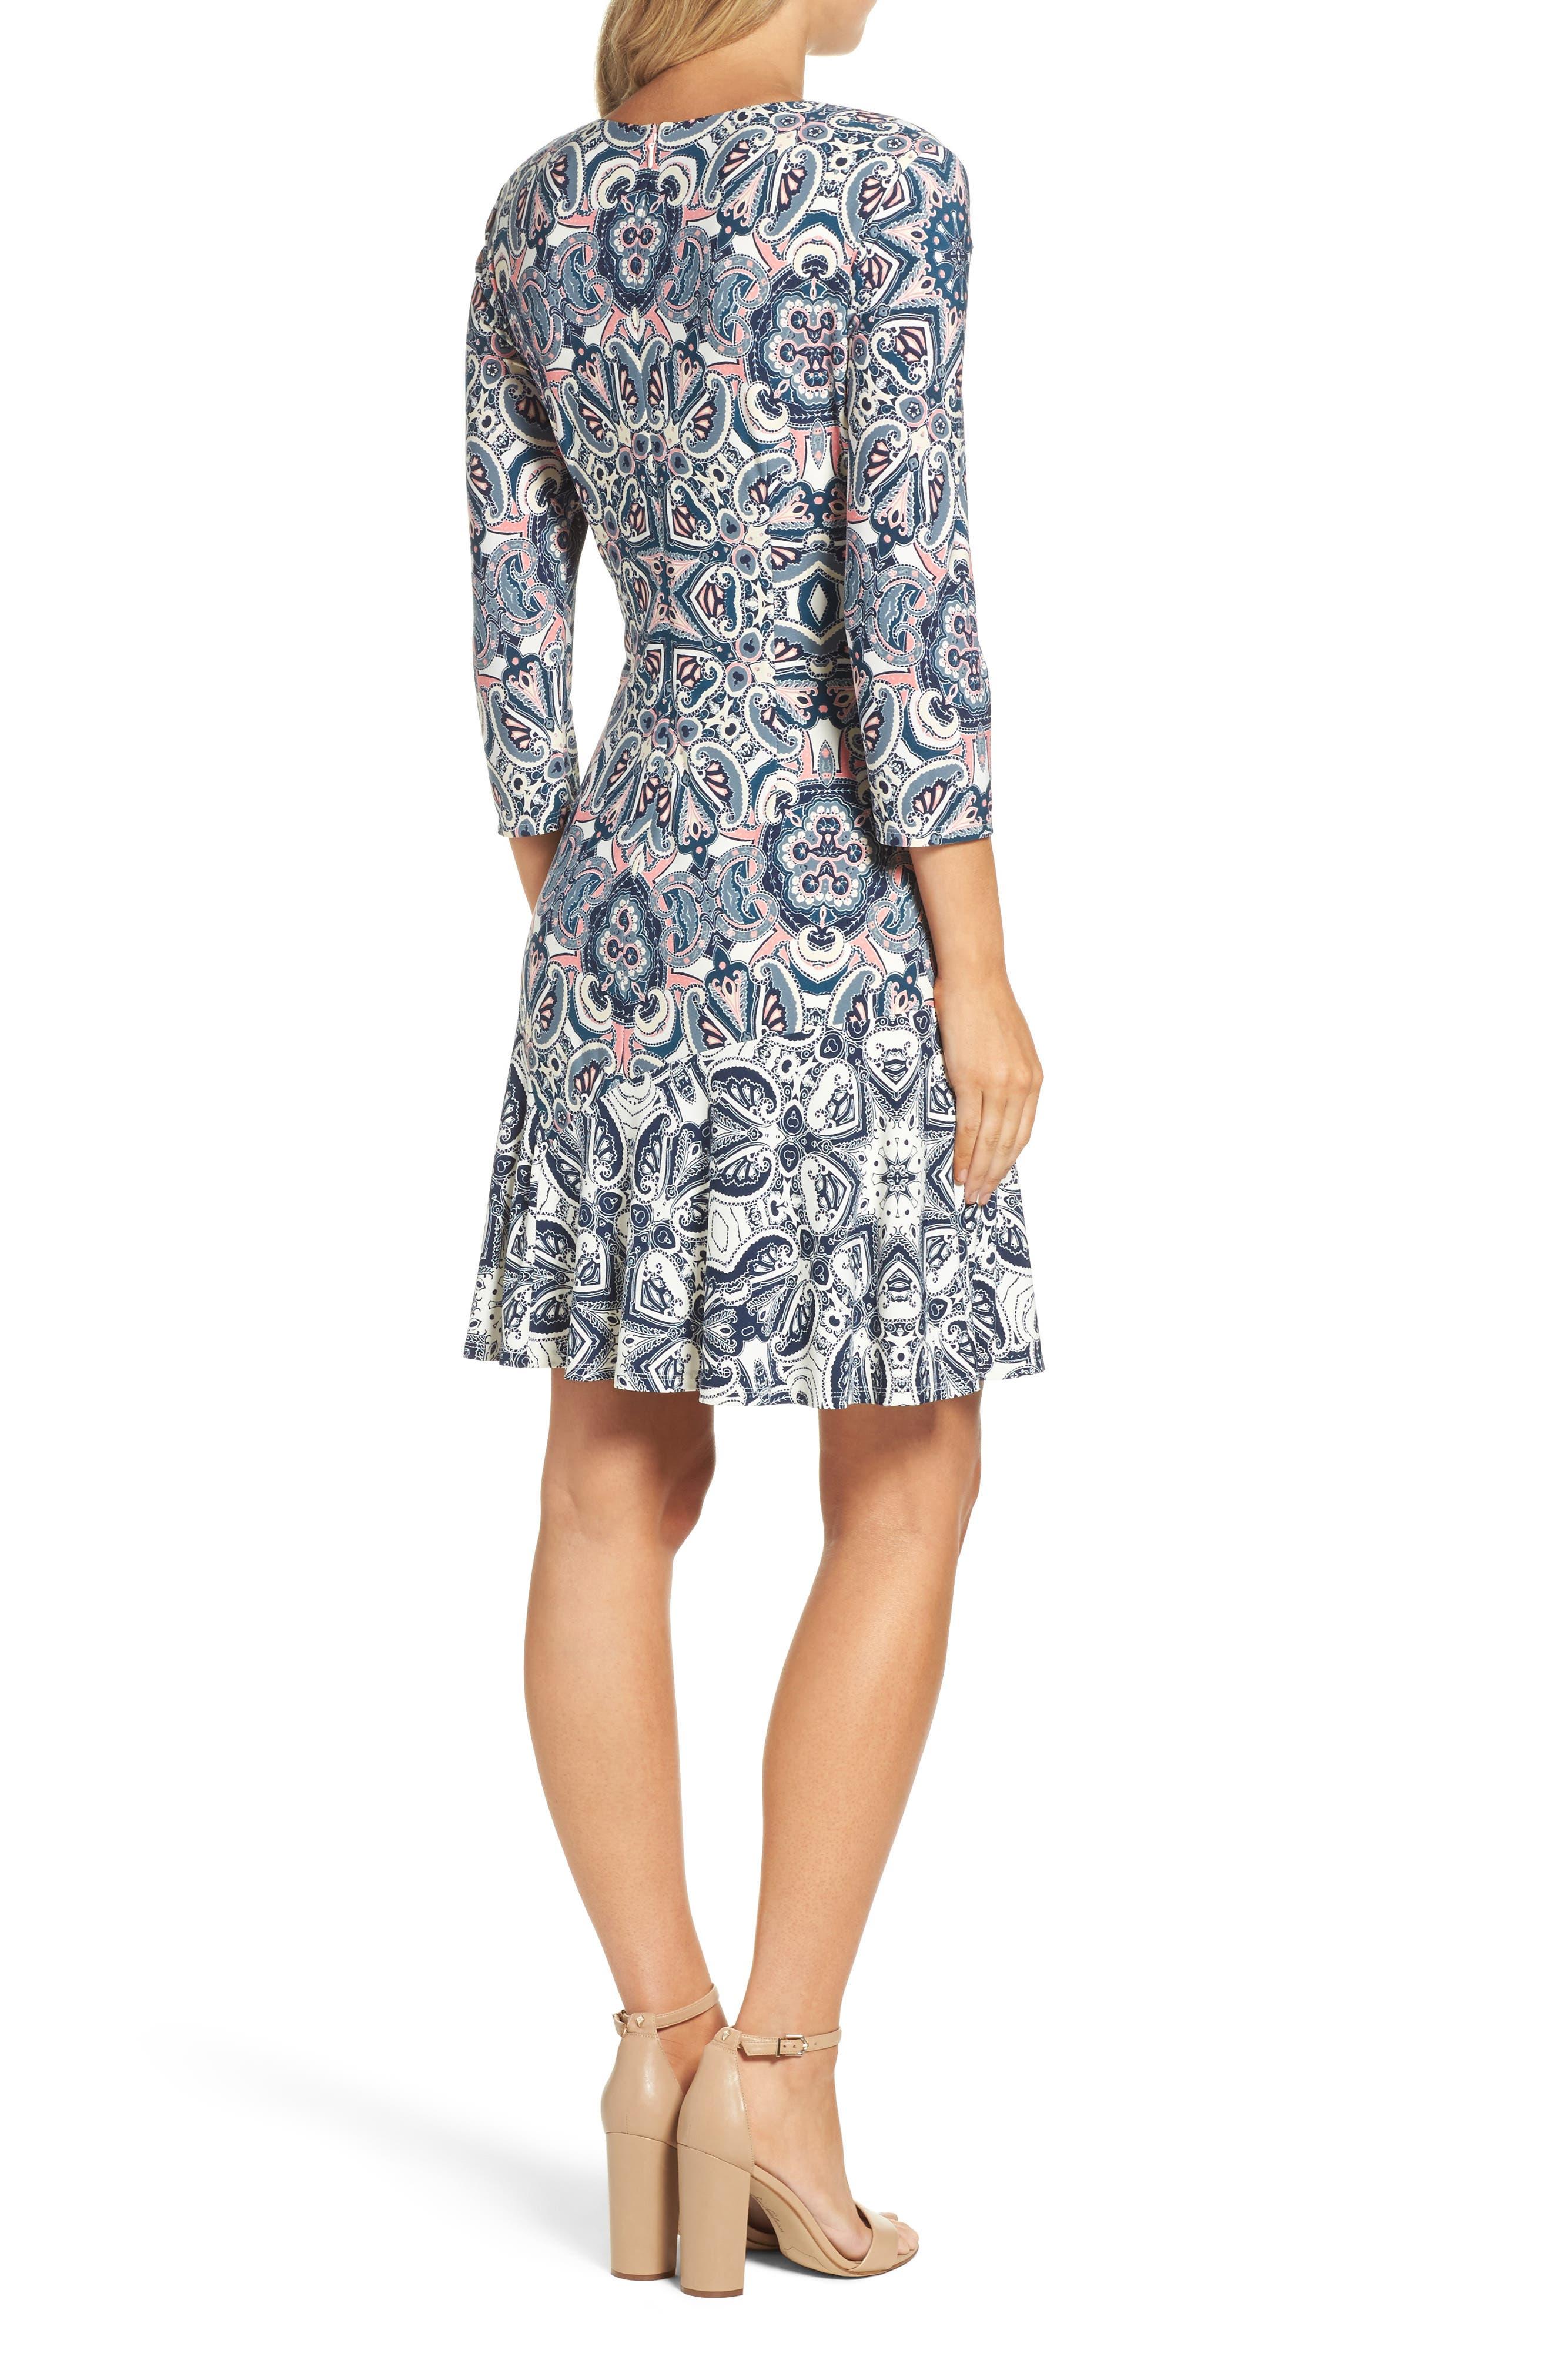 ELIZA J,                             Print Knit A-Line Dress,                             Alternate thumbnail 2, color,                             TEAL